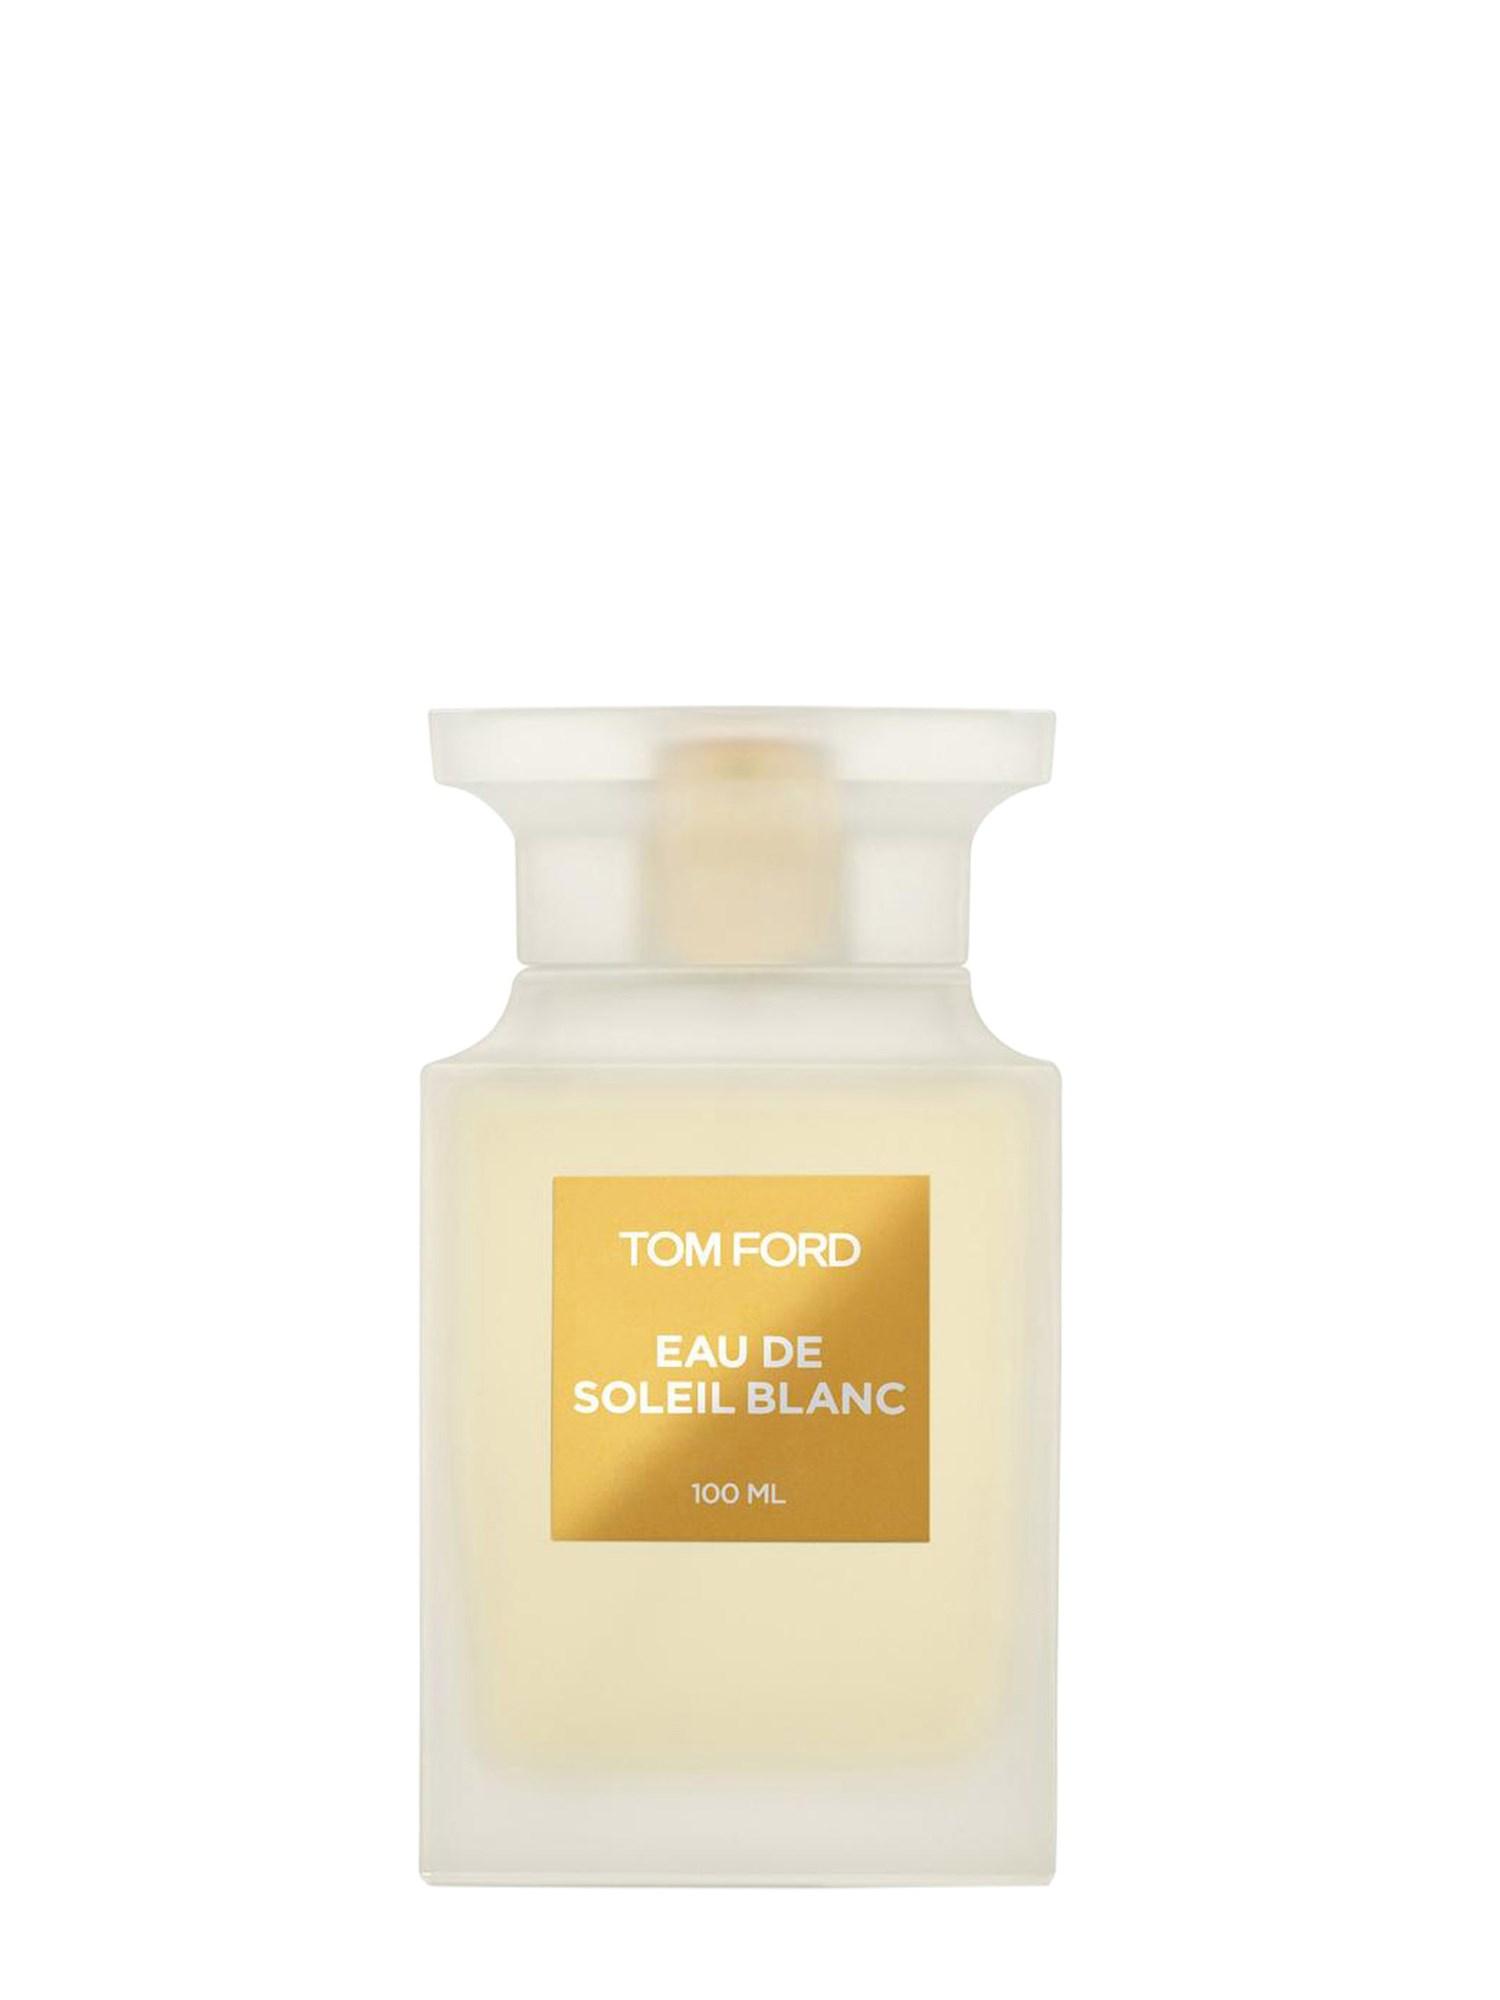 tom ford eau de soleil blanc perfume